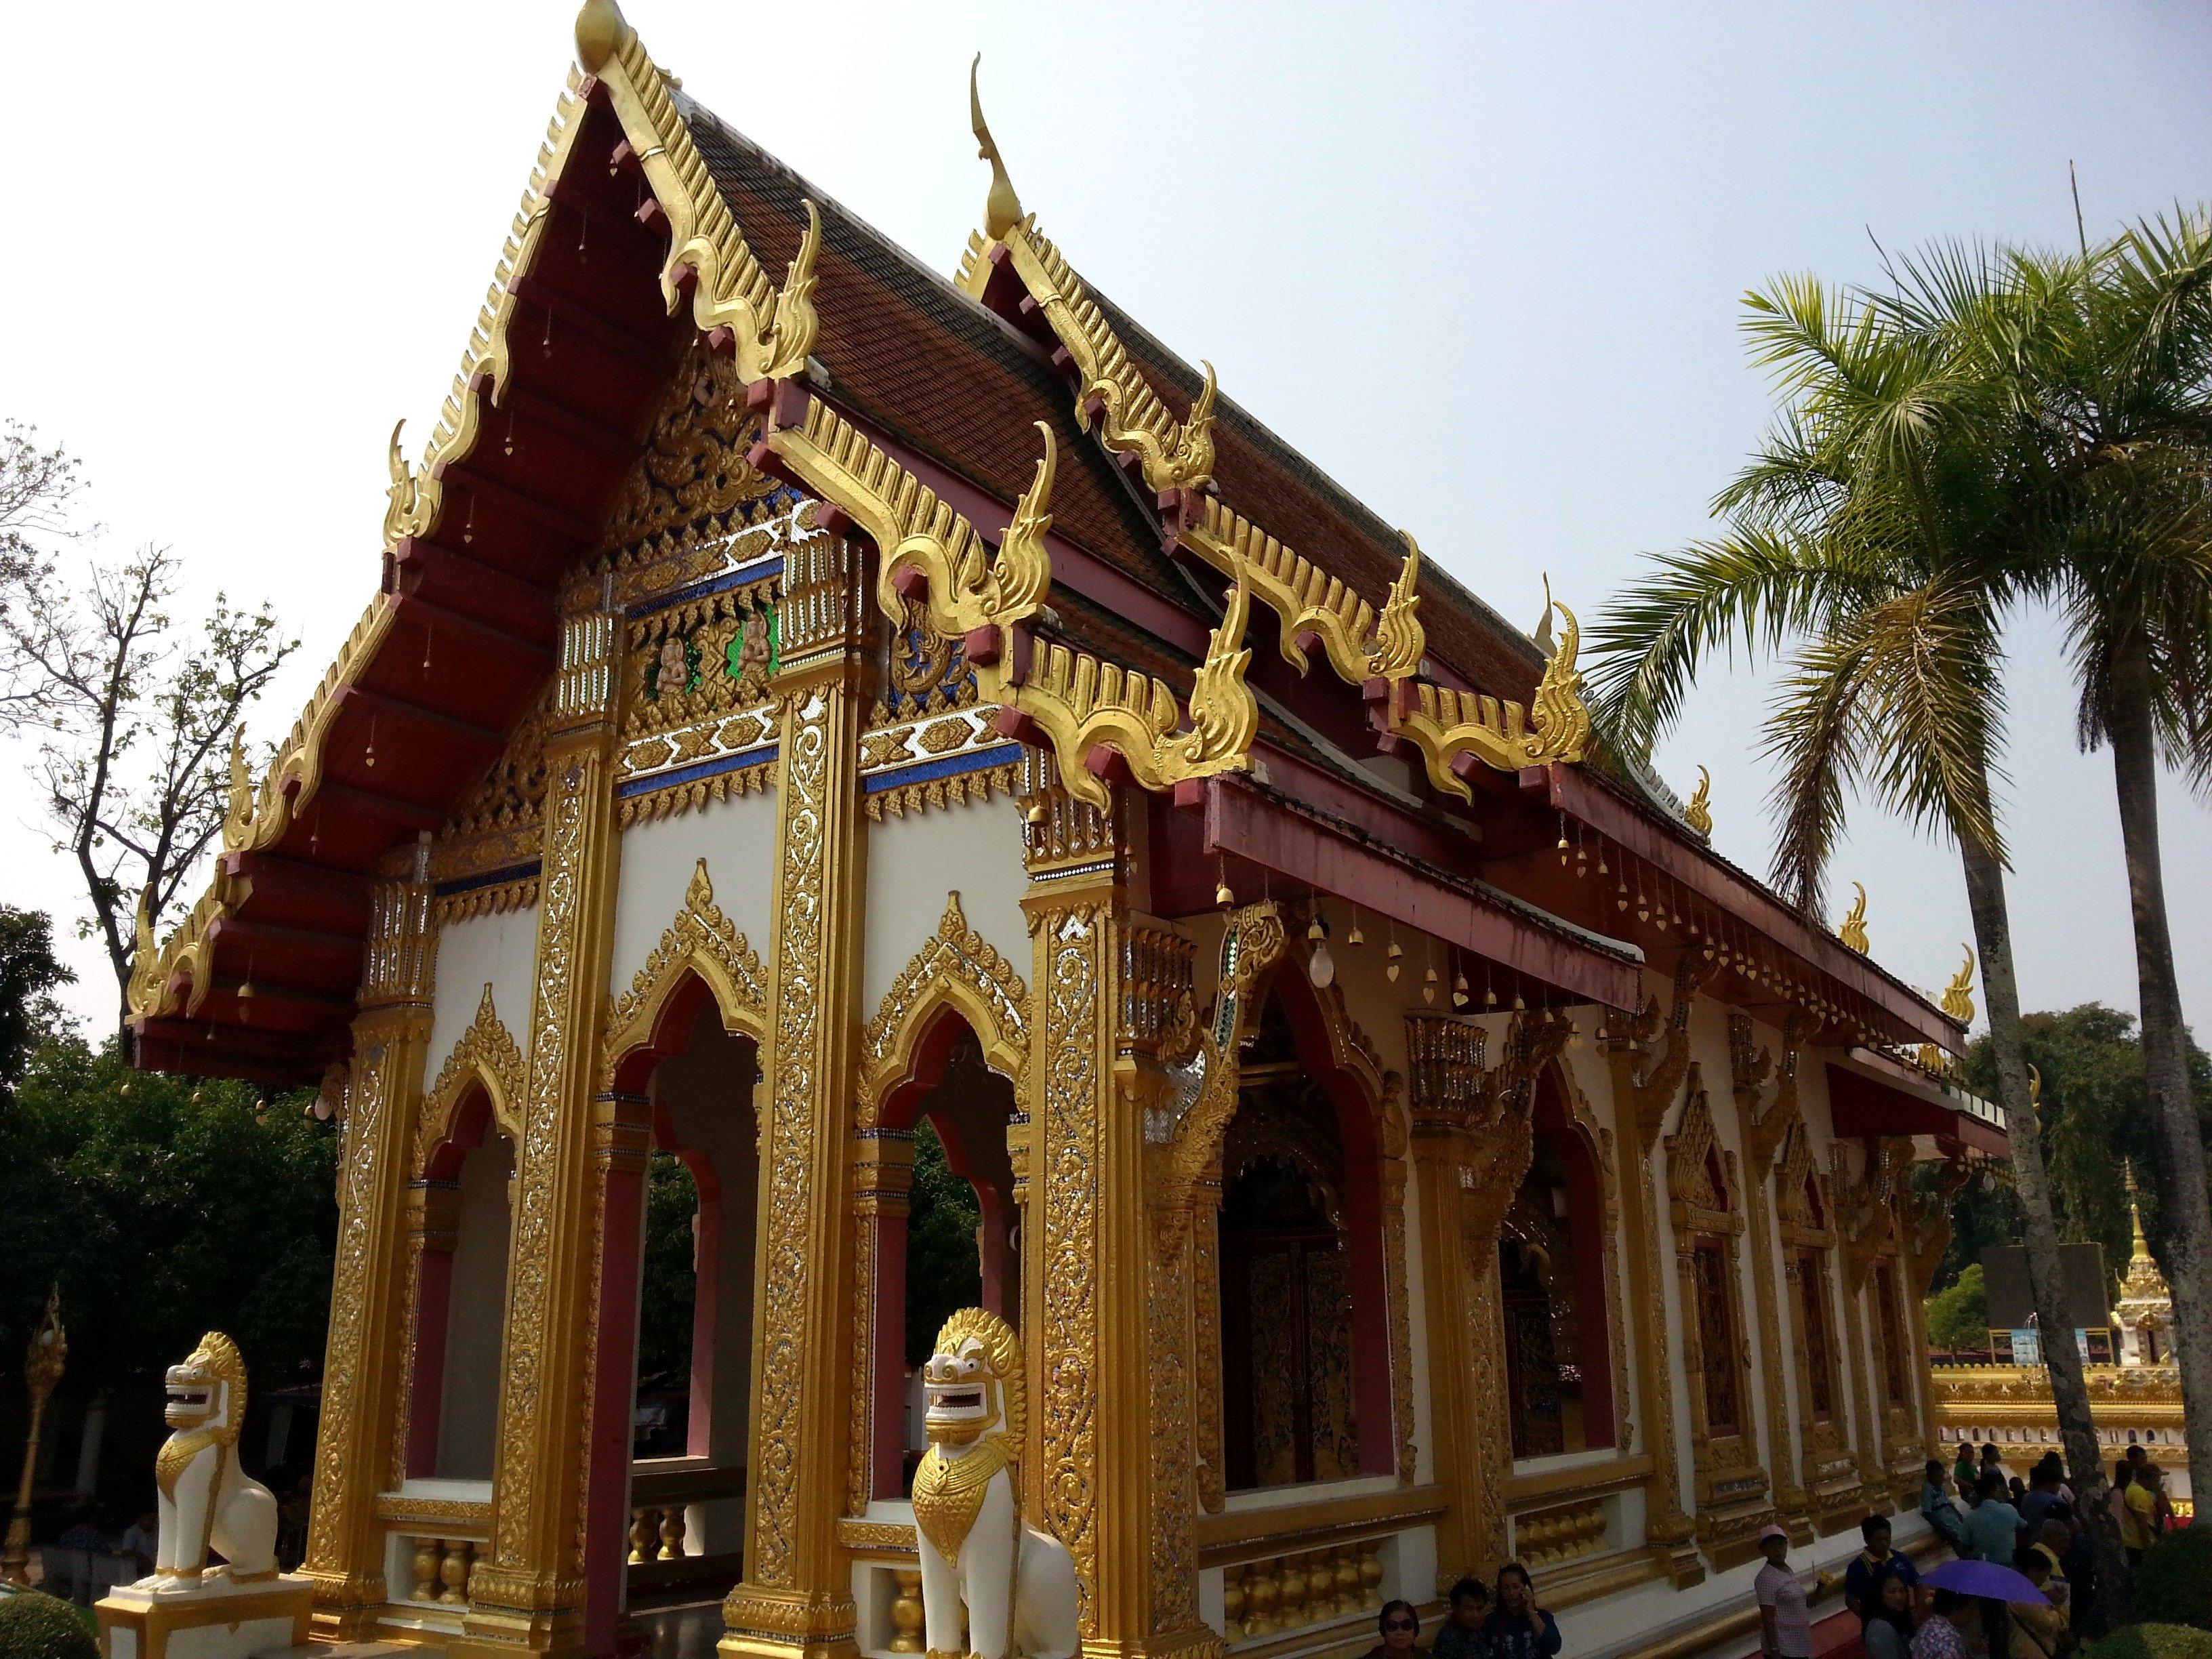 Ordination Hall at Wat Phra That Phanom